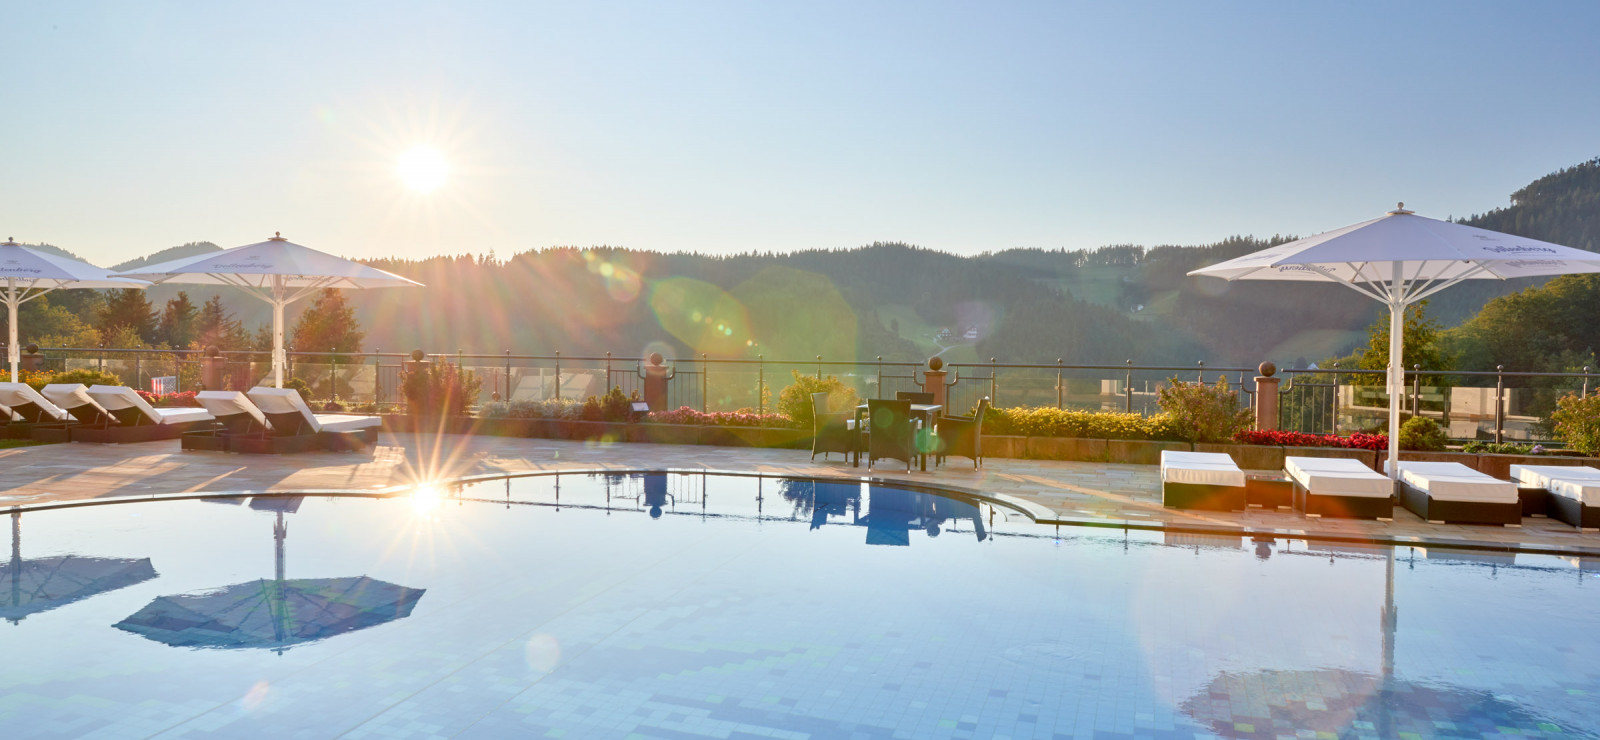 Schwarzwald Resort Dollenberg - Relais & Châteaux Bilder   Bild 1